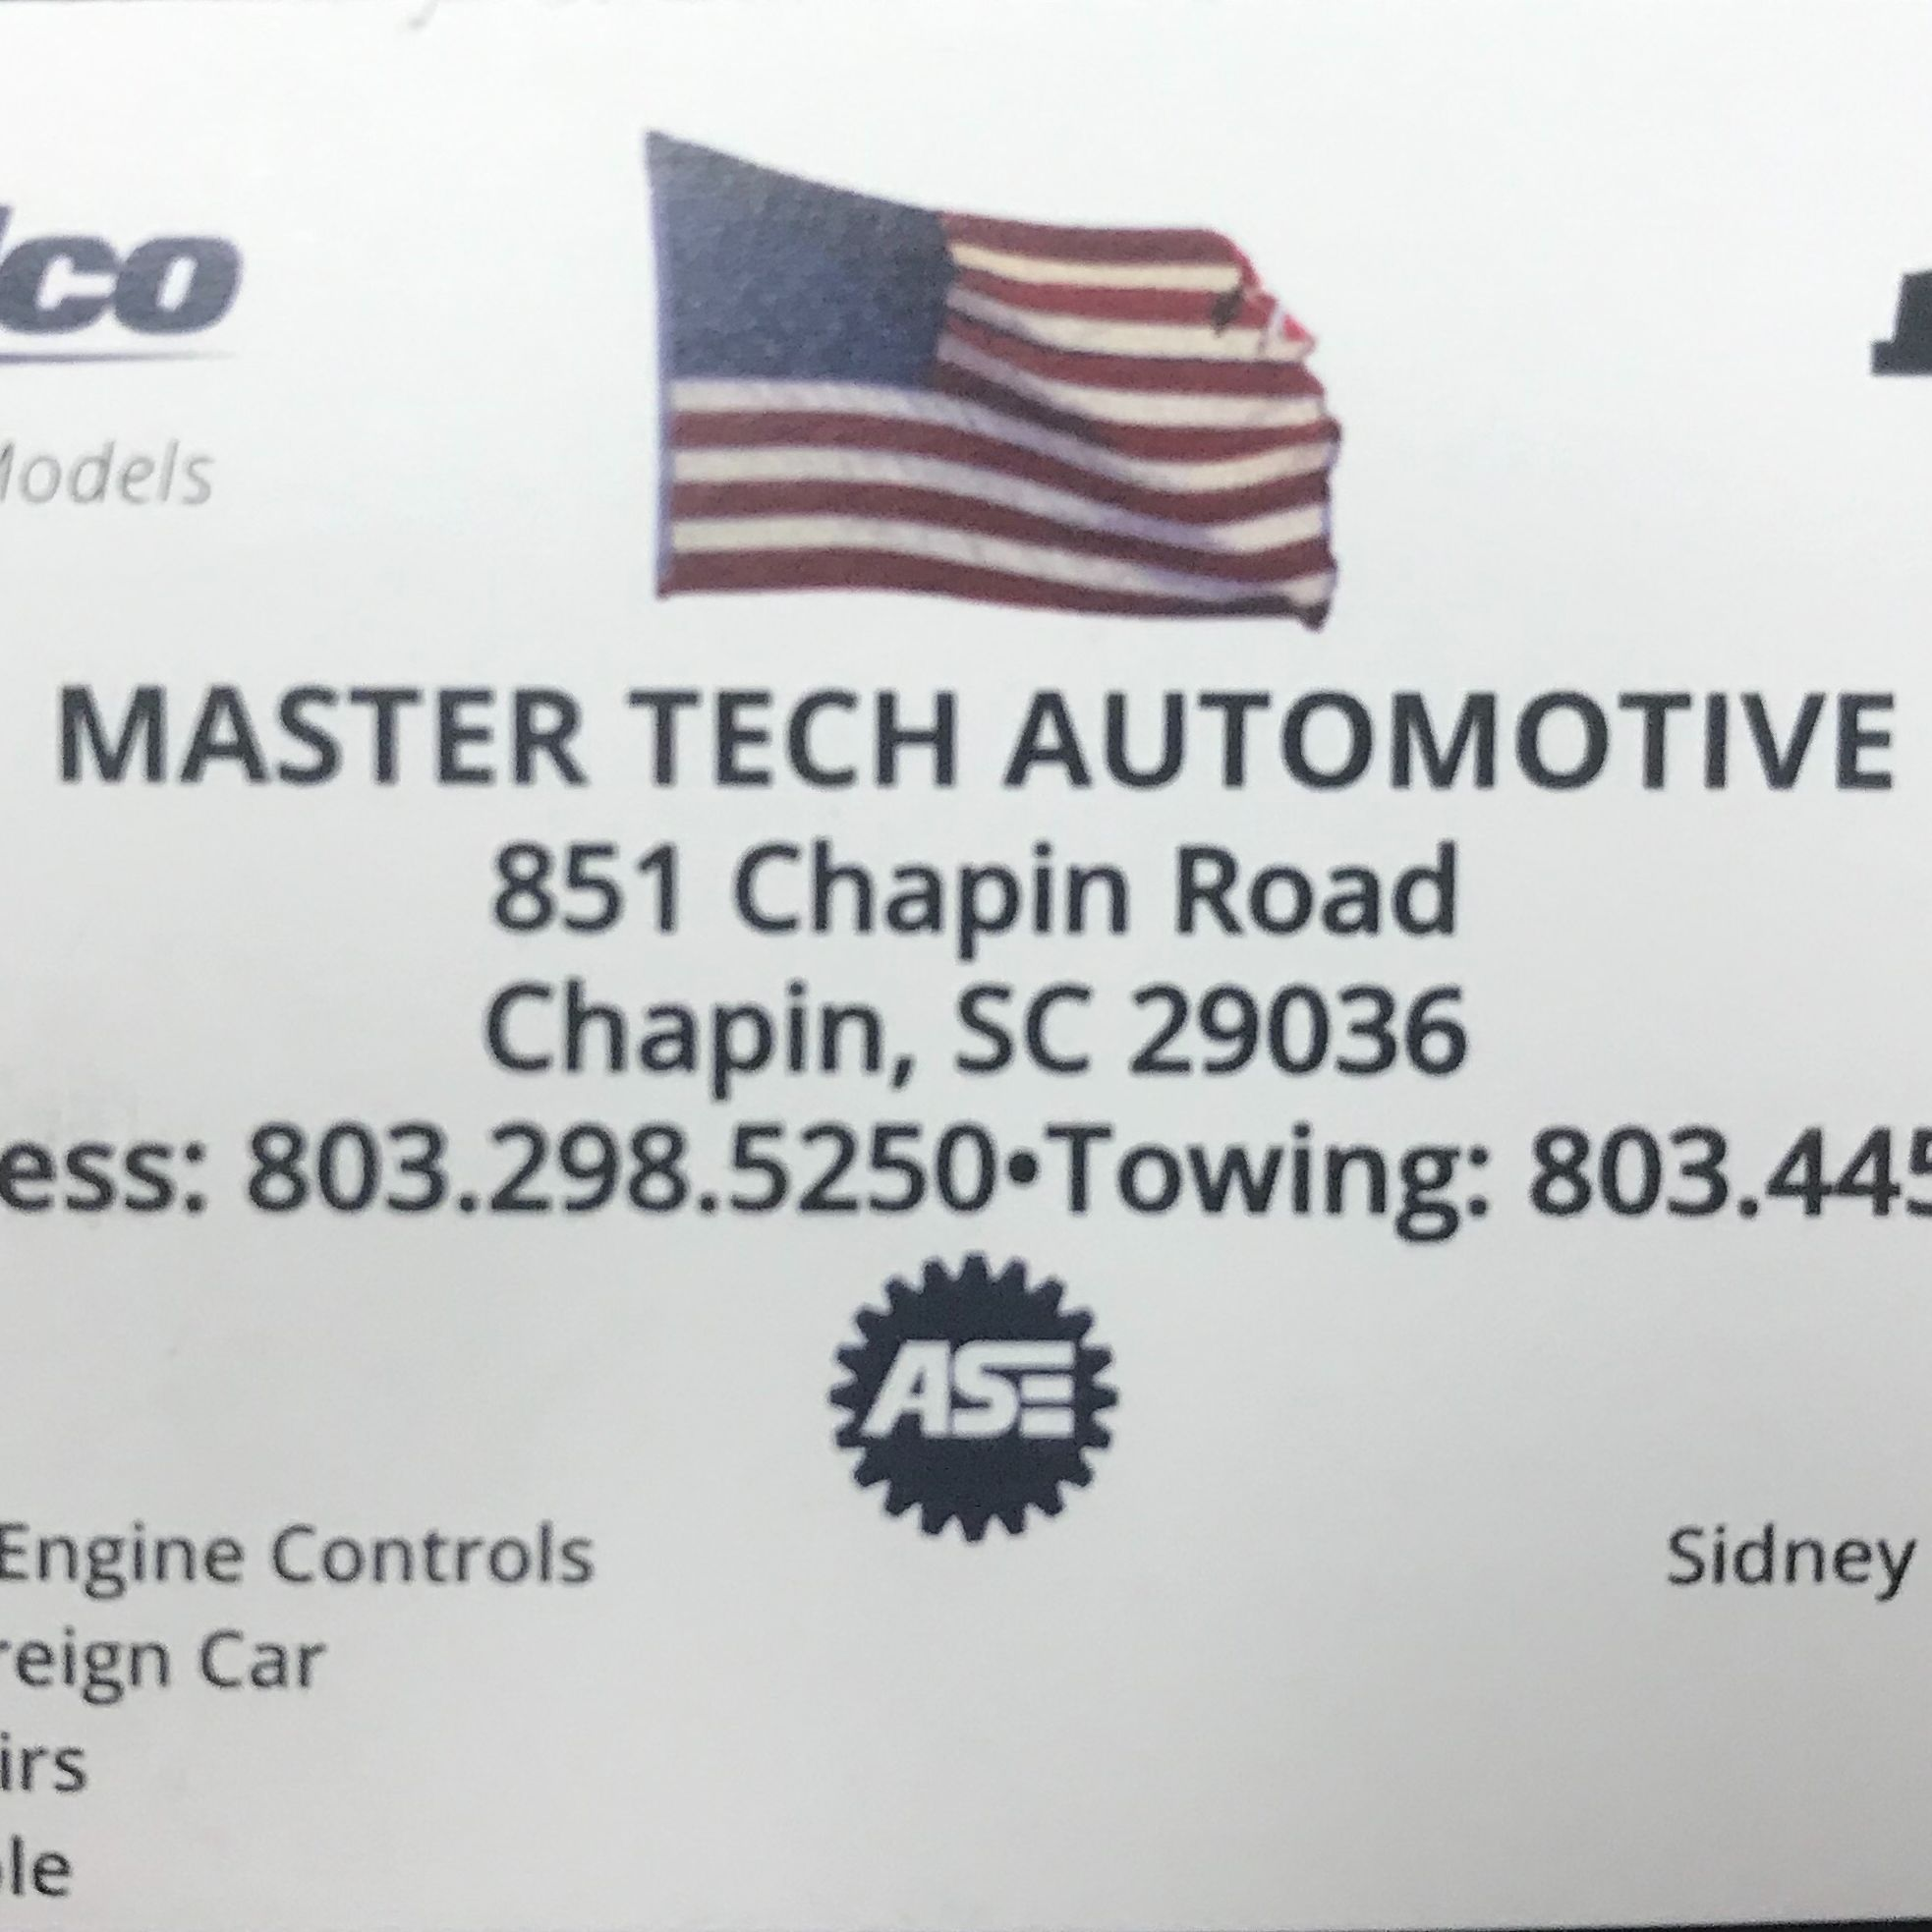 Master Tech Automotive